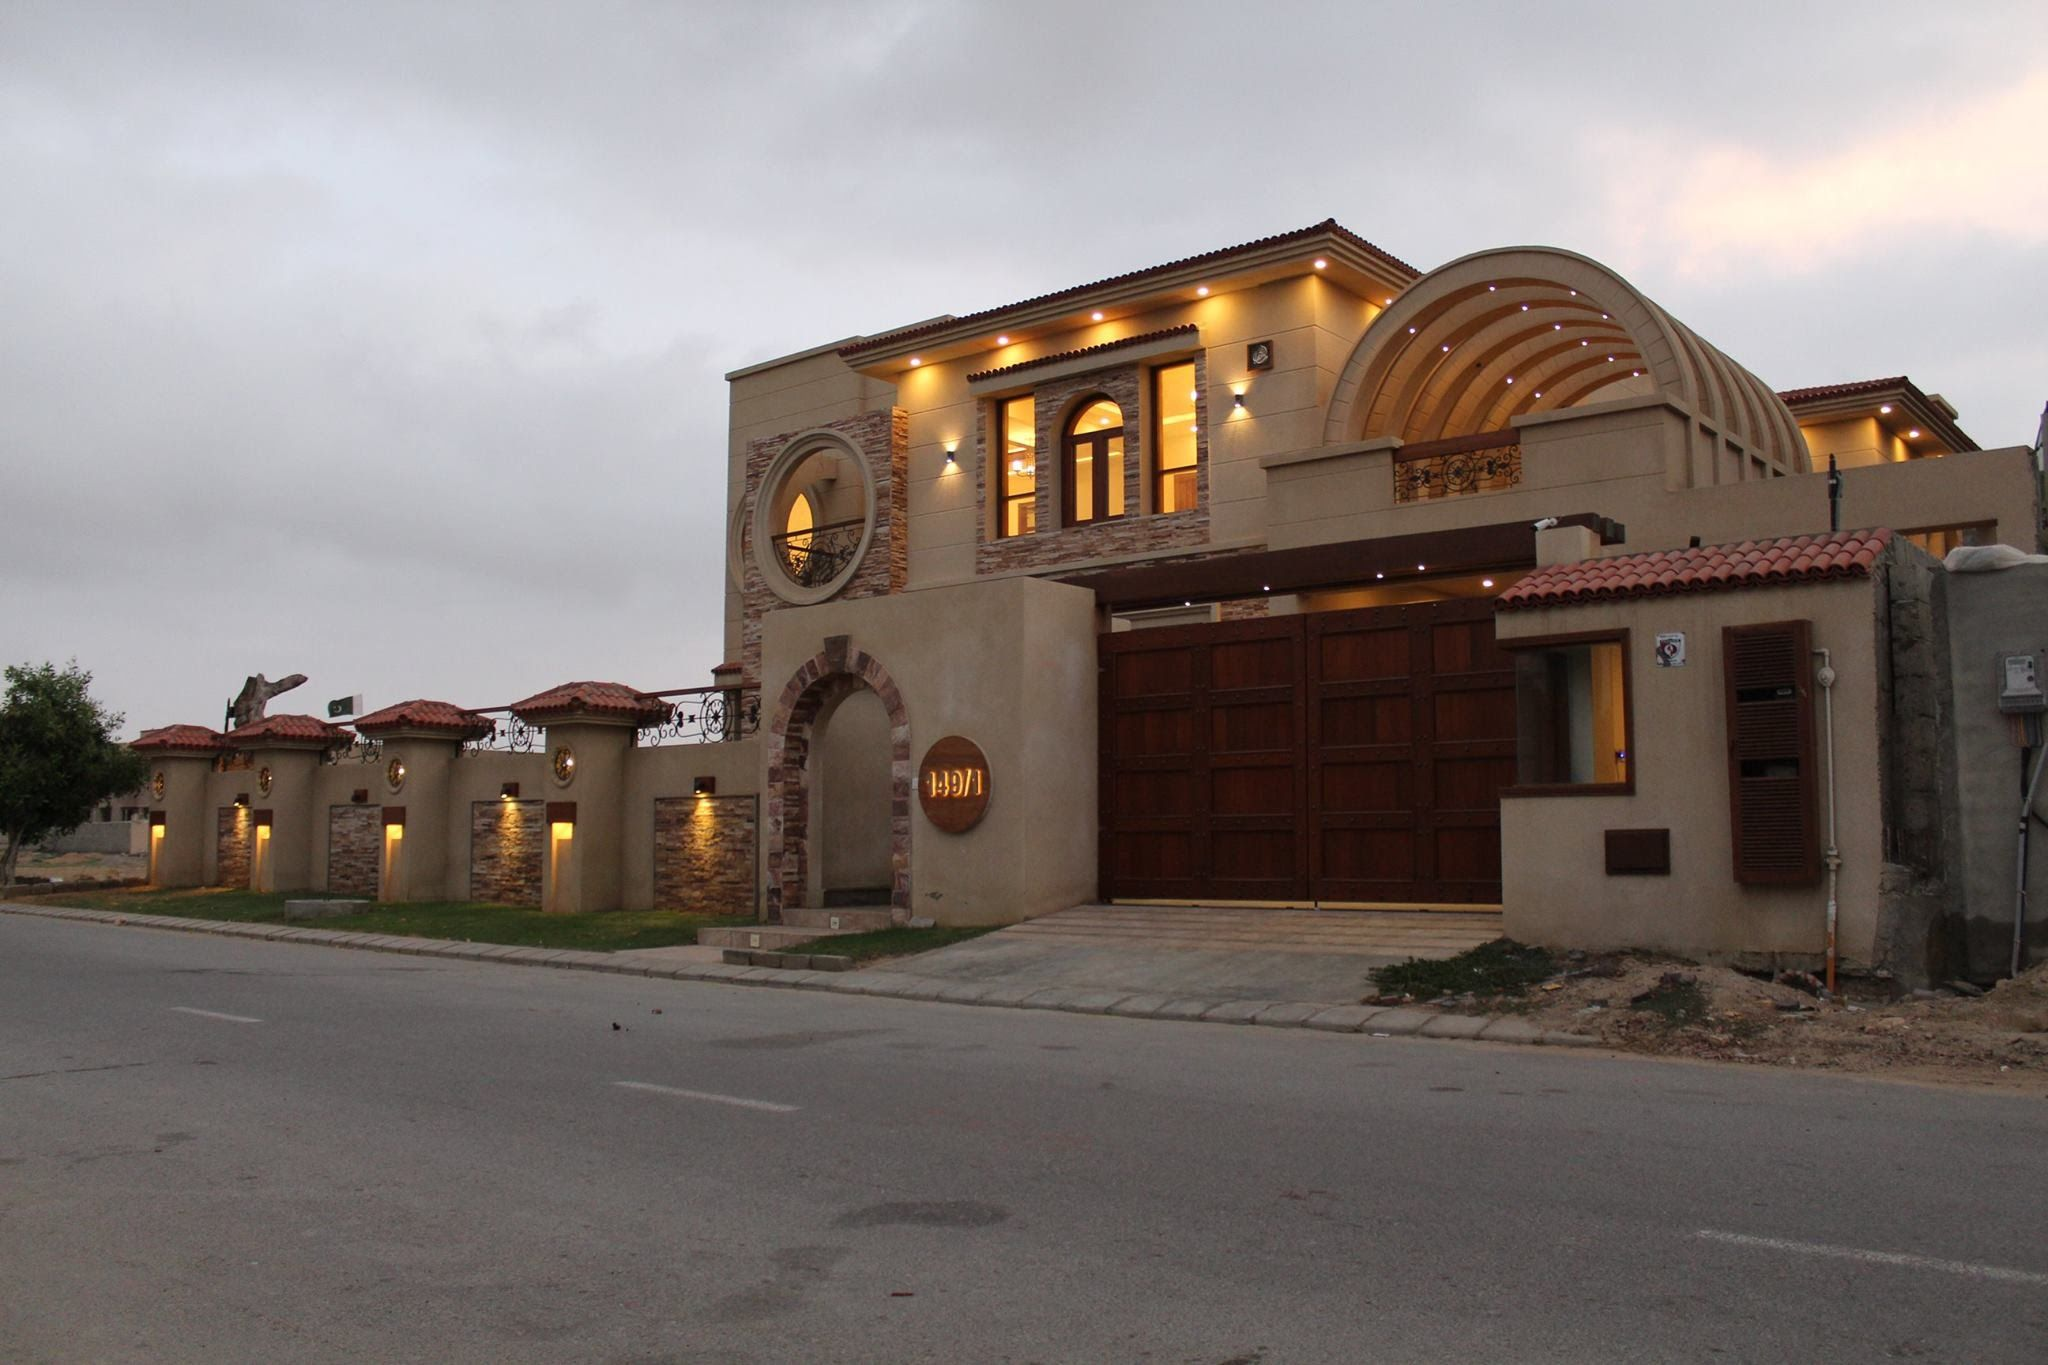 dream house for sale in dream villa karachi pakistan model house - Dream House Model